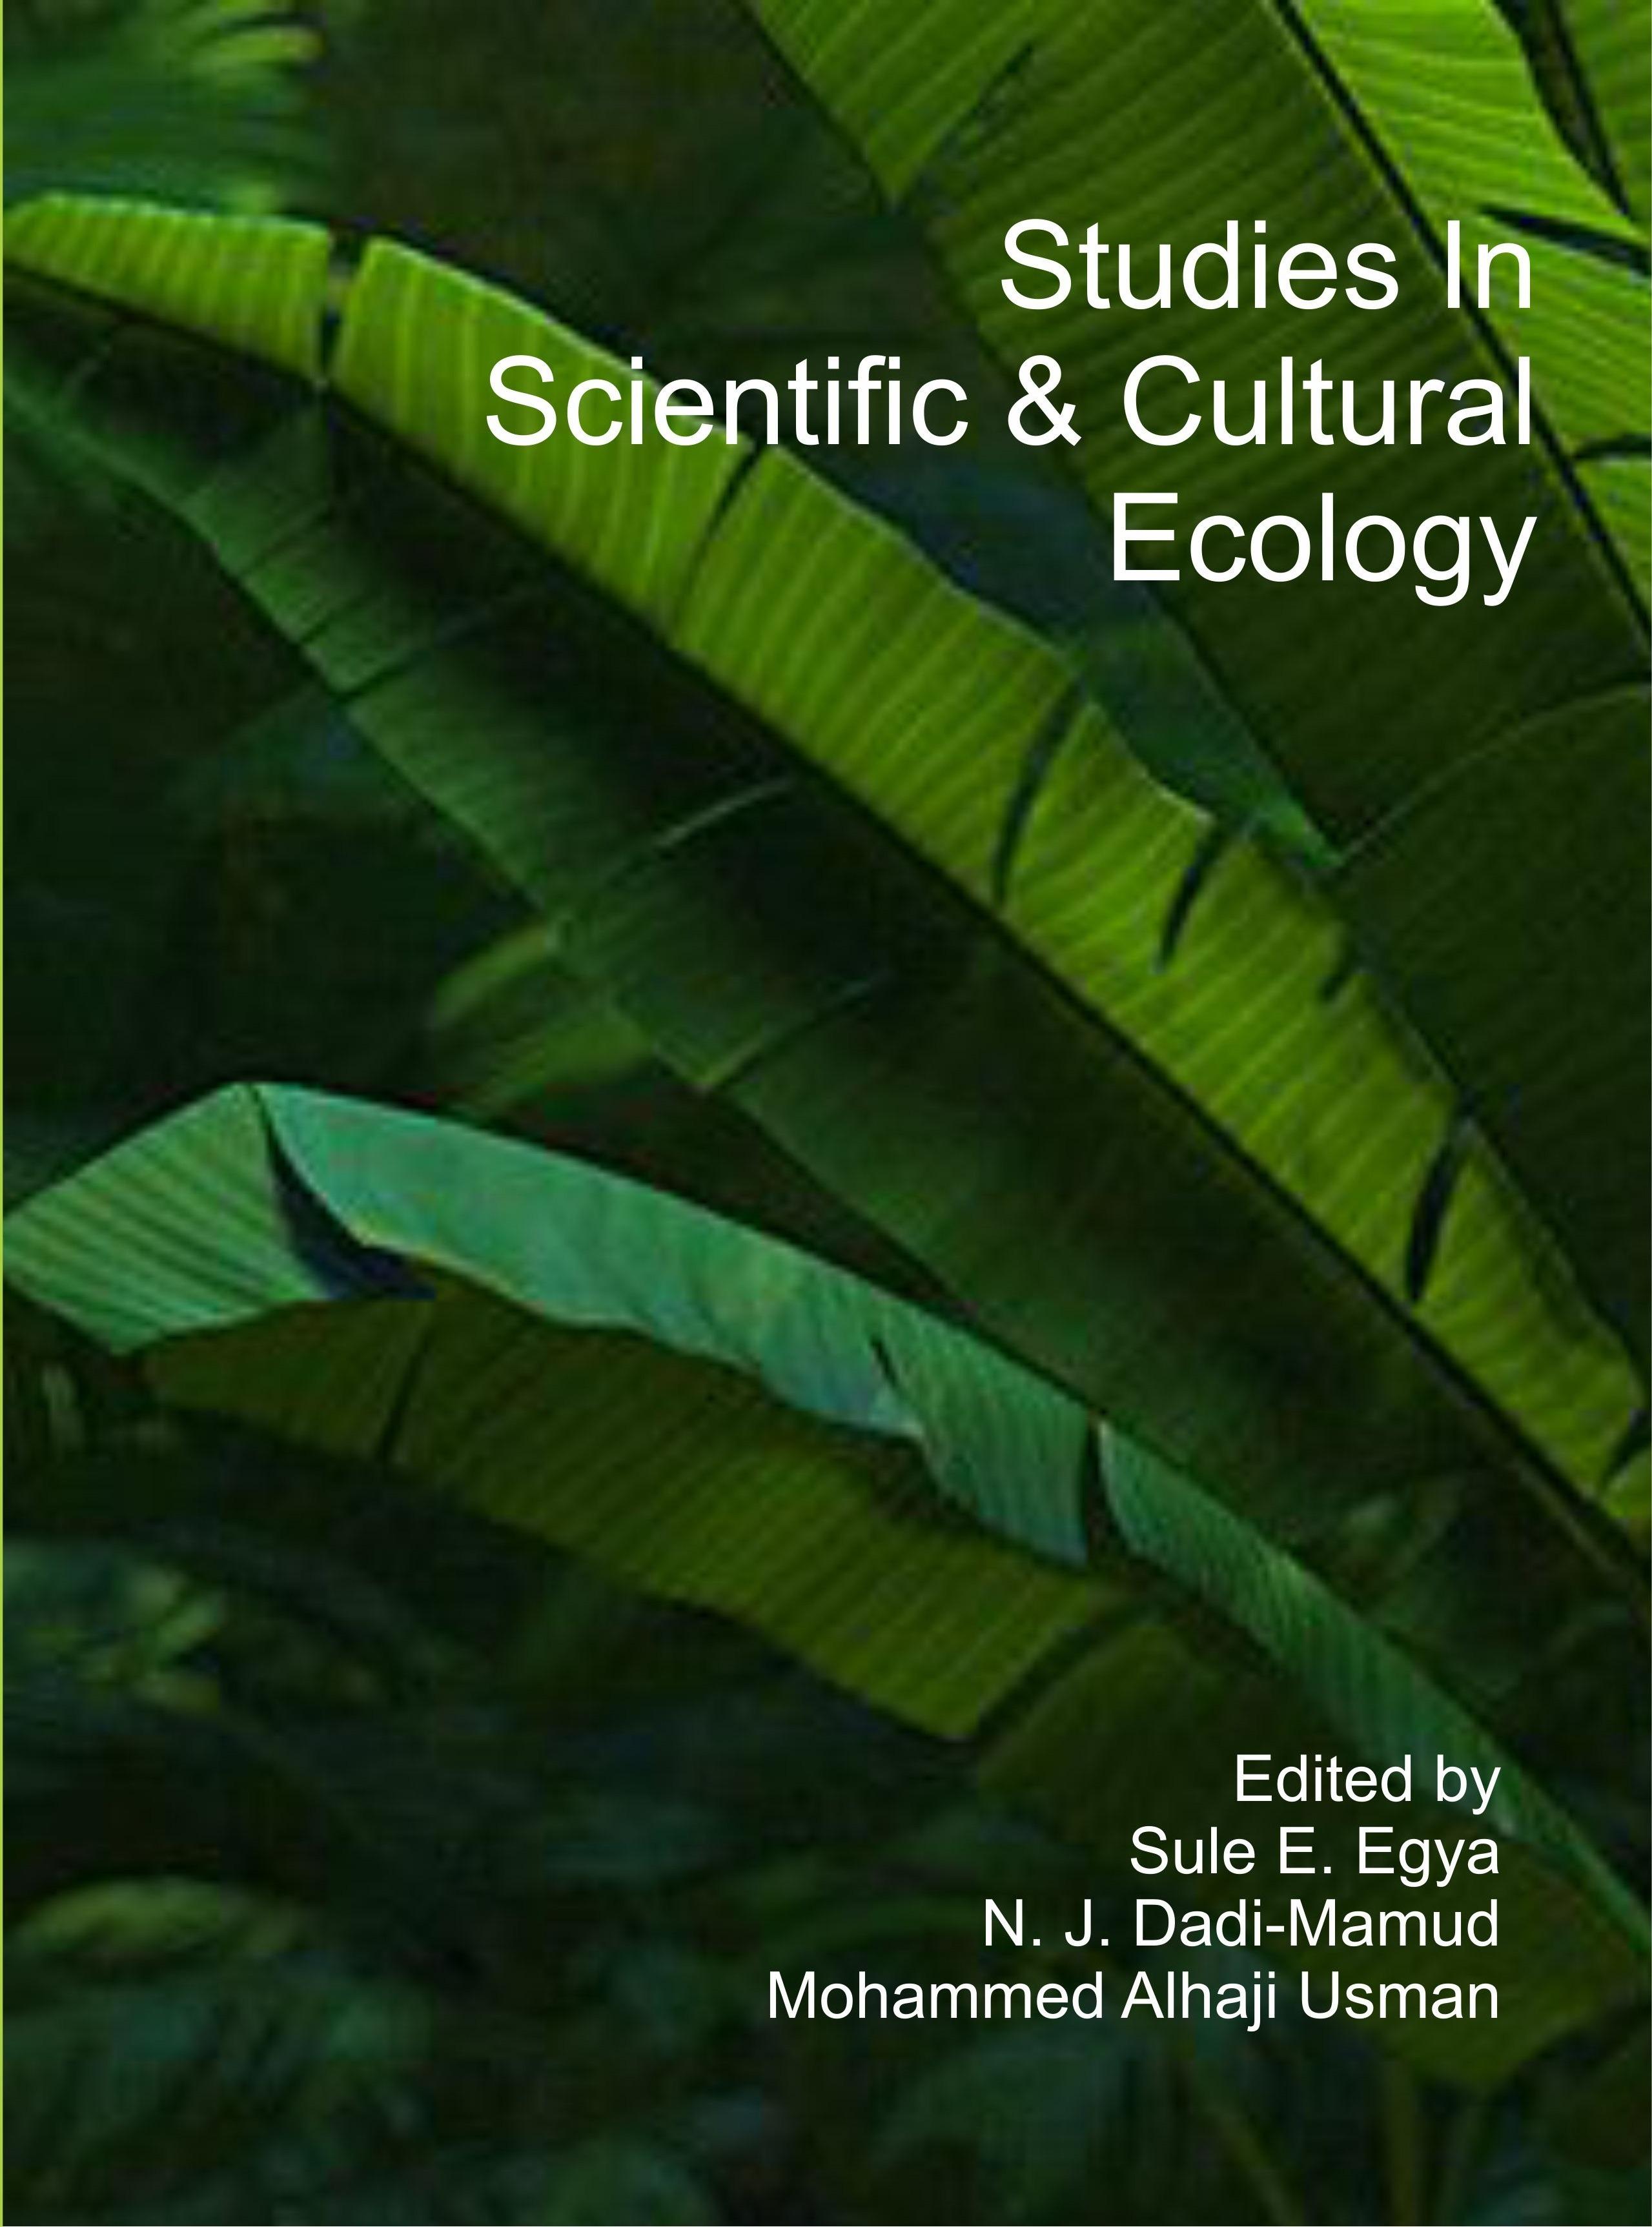 Studies In Scientific & Cultural Ecology